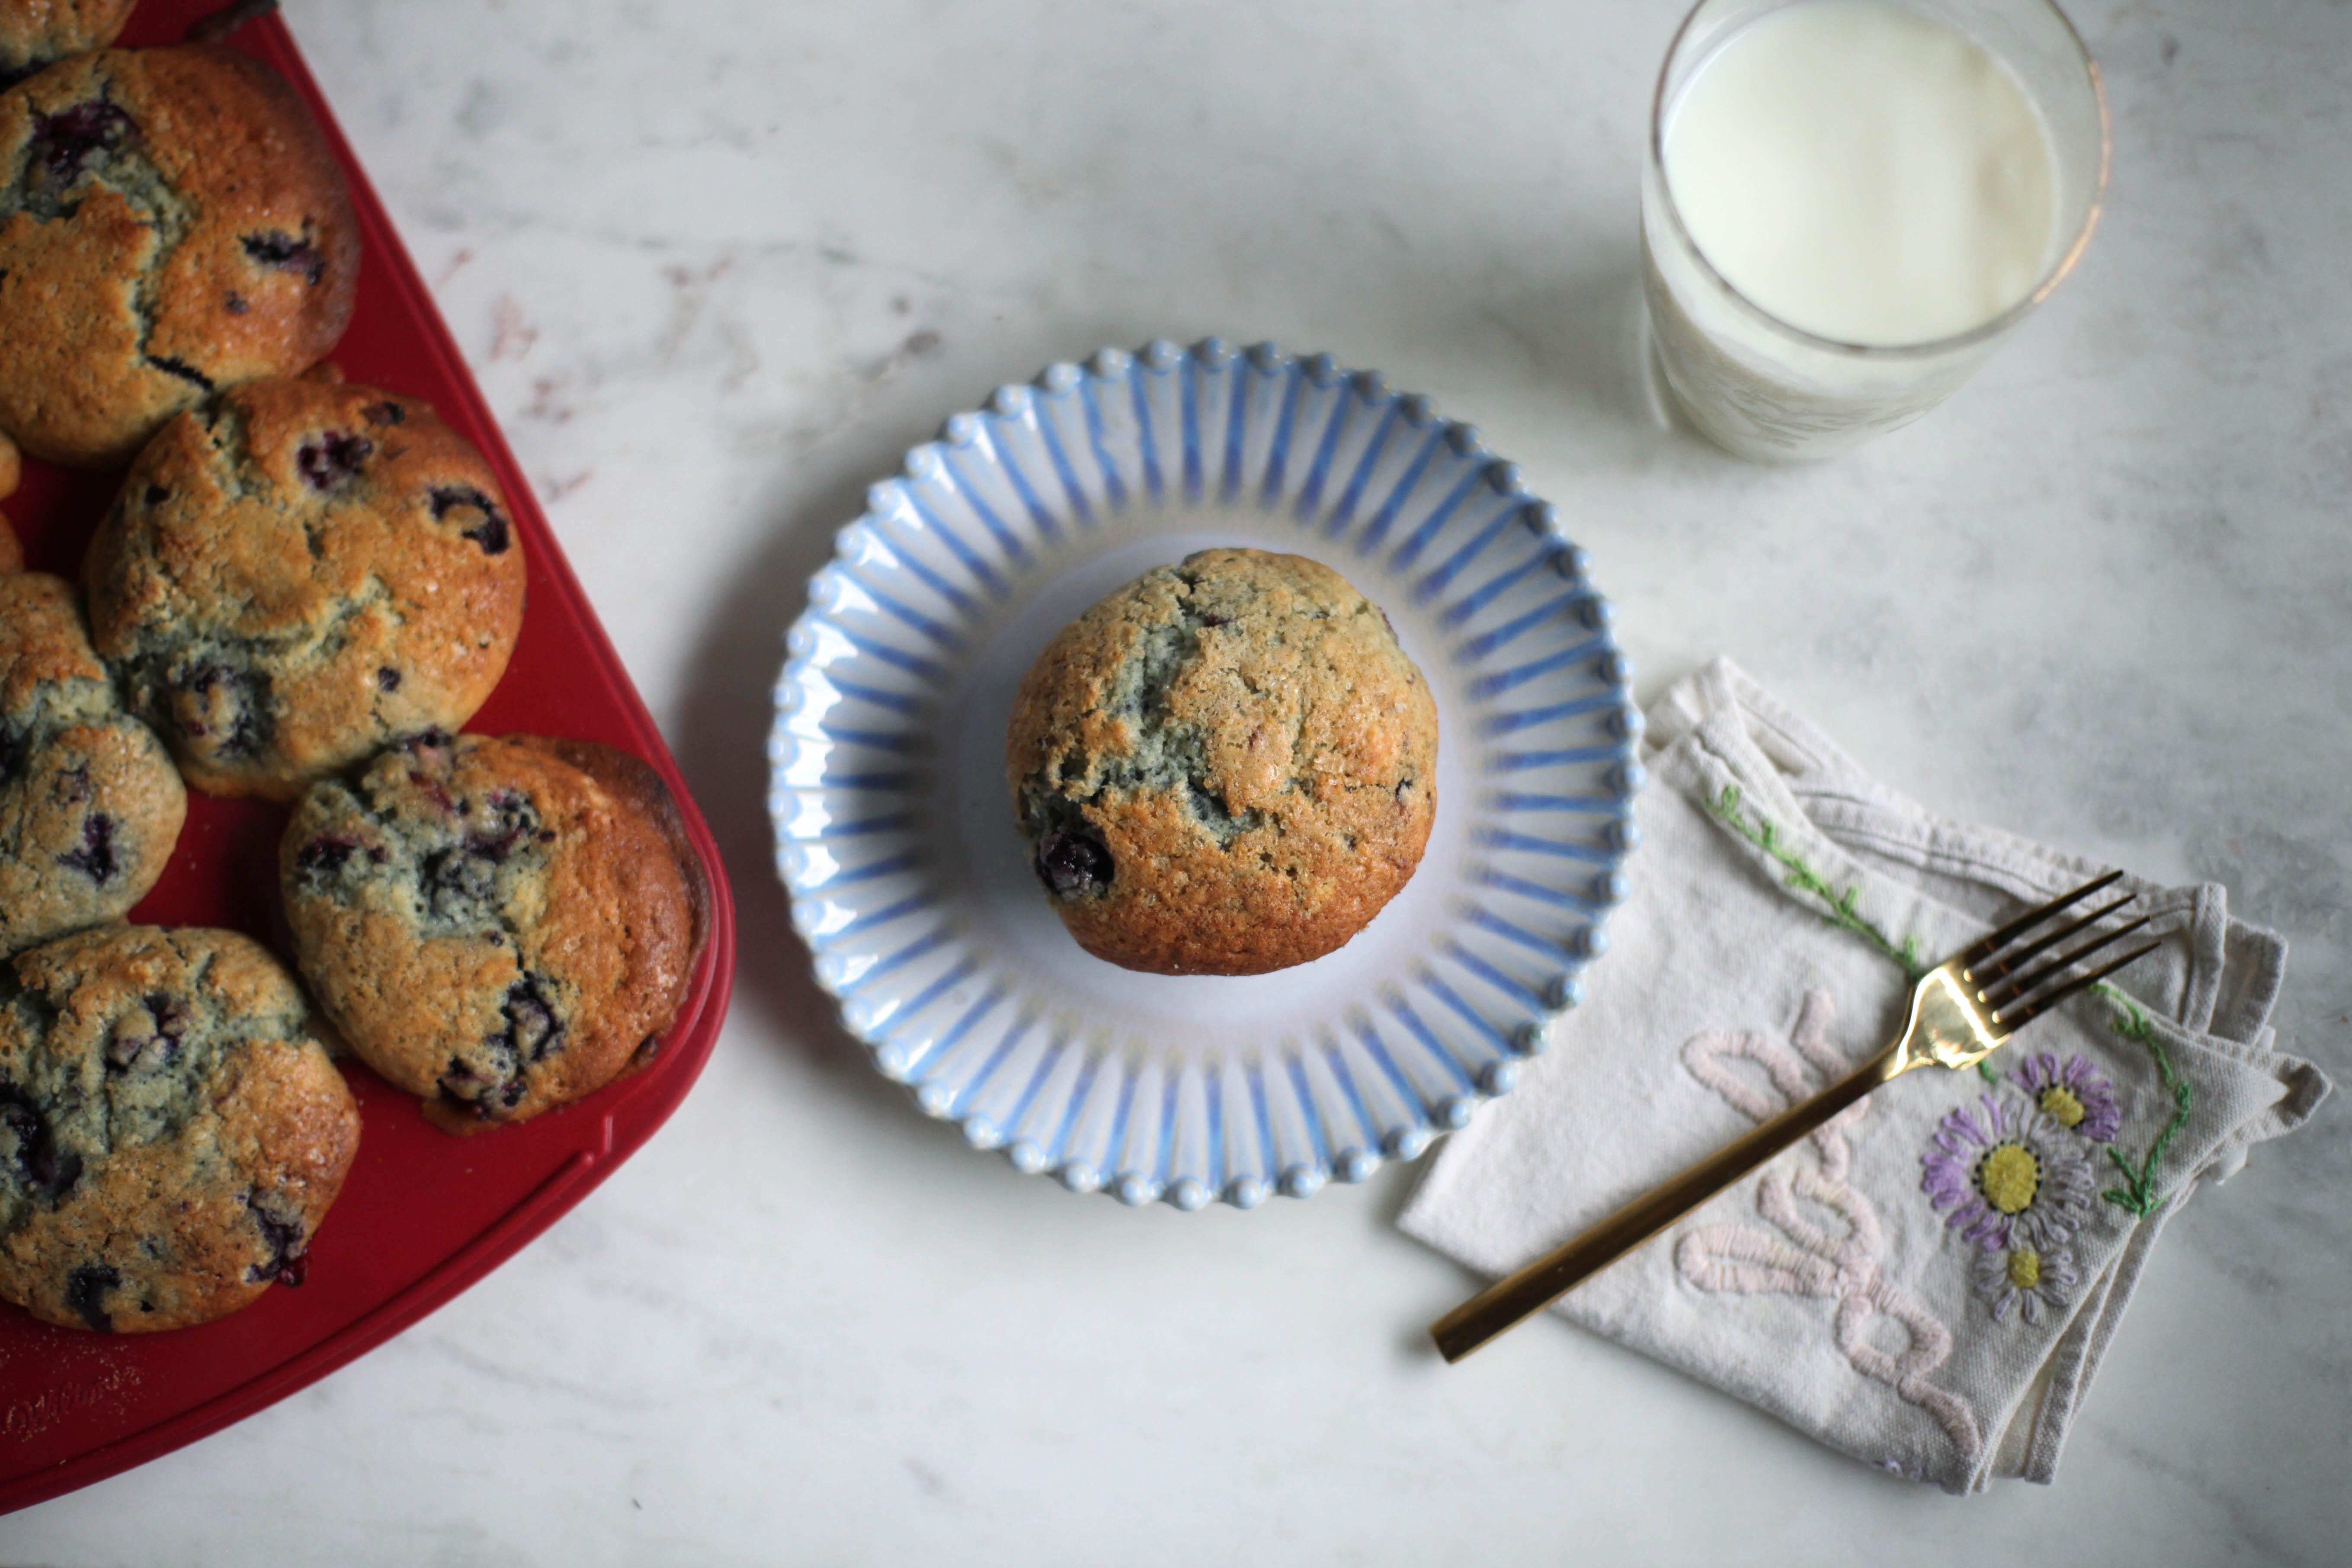 Mixed Berry Muffins - Tastemaker Blog